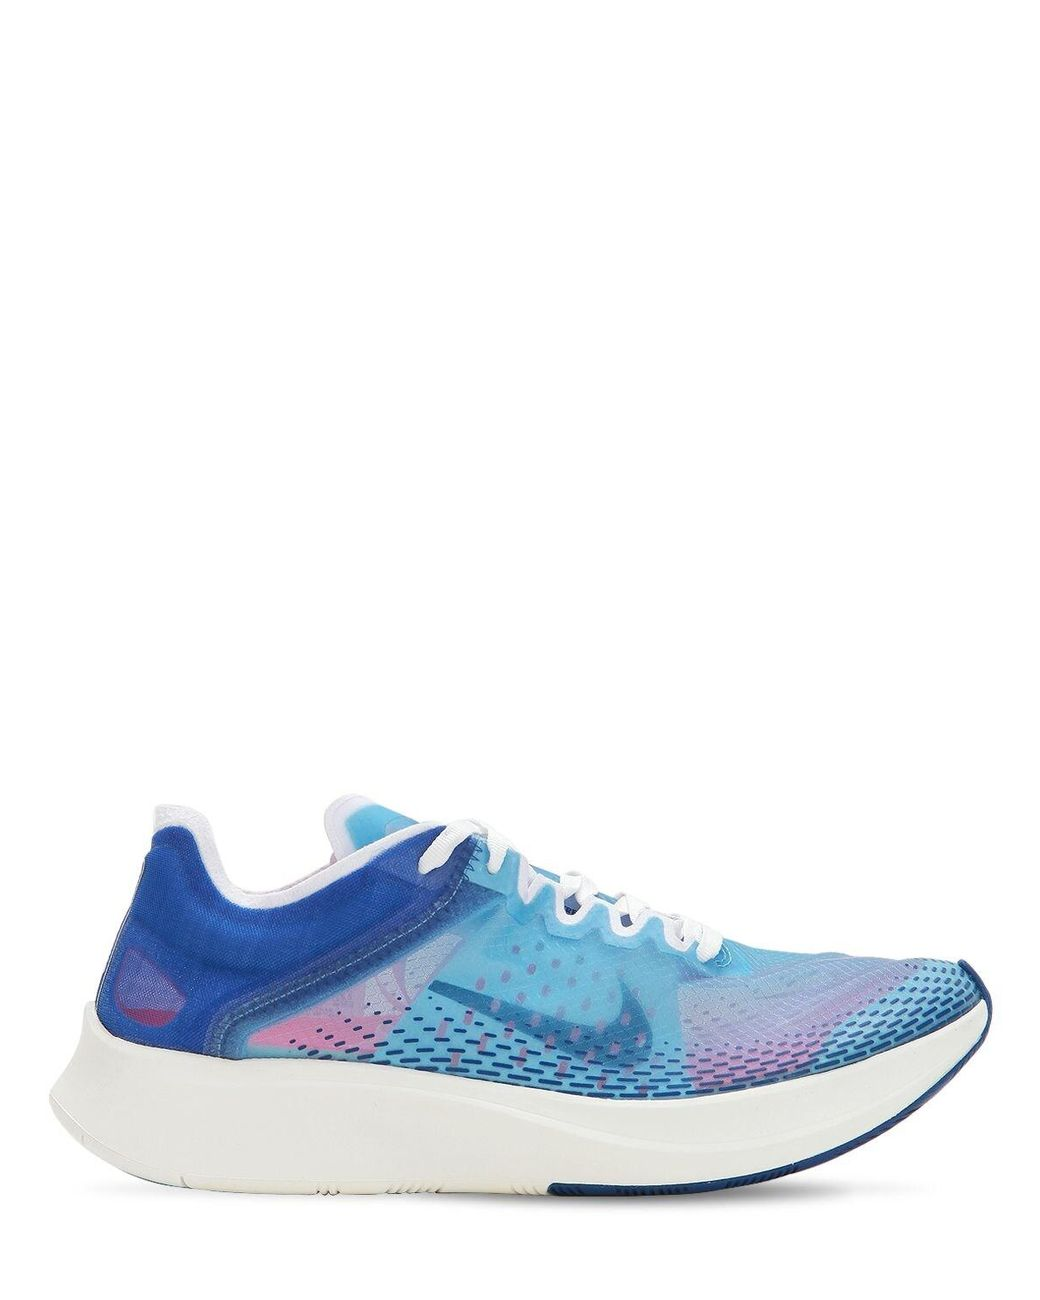 Sp In Nike Fly Lyst Sneakers Blue Fast Zoom Men For RLj5A34